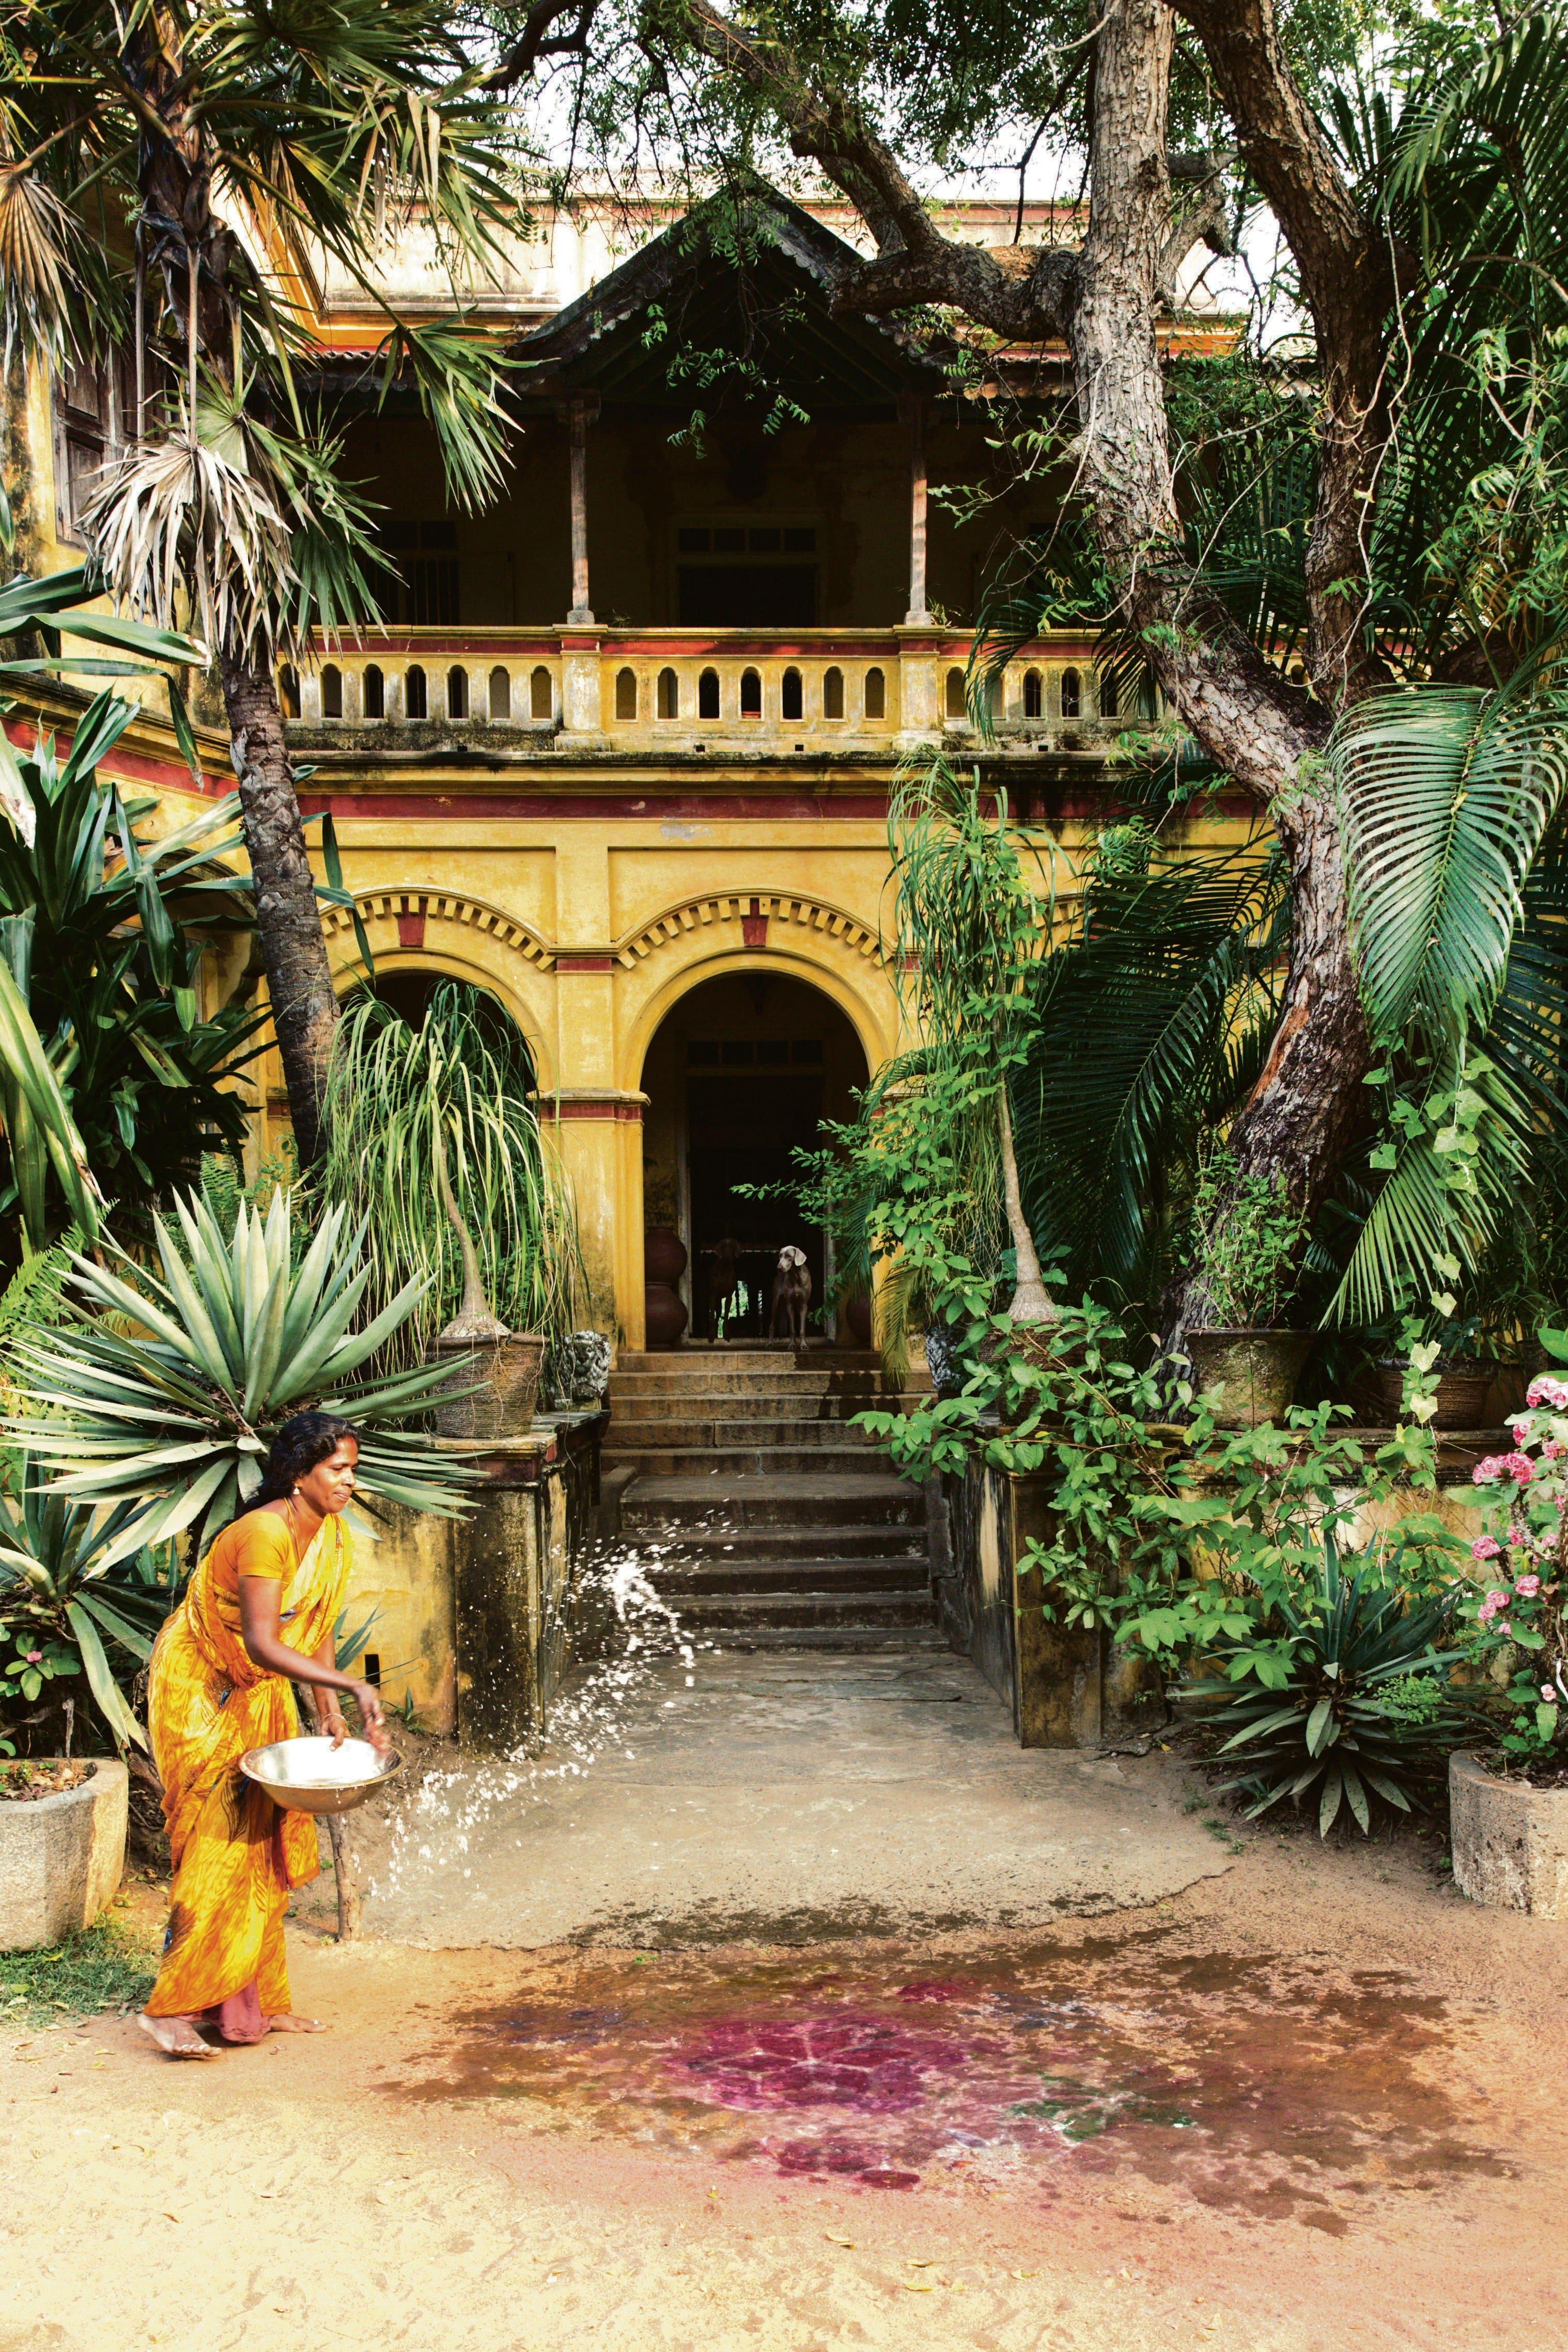 Kandadu House in Kandadu, Tamil Nadu